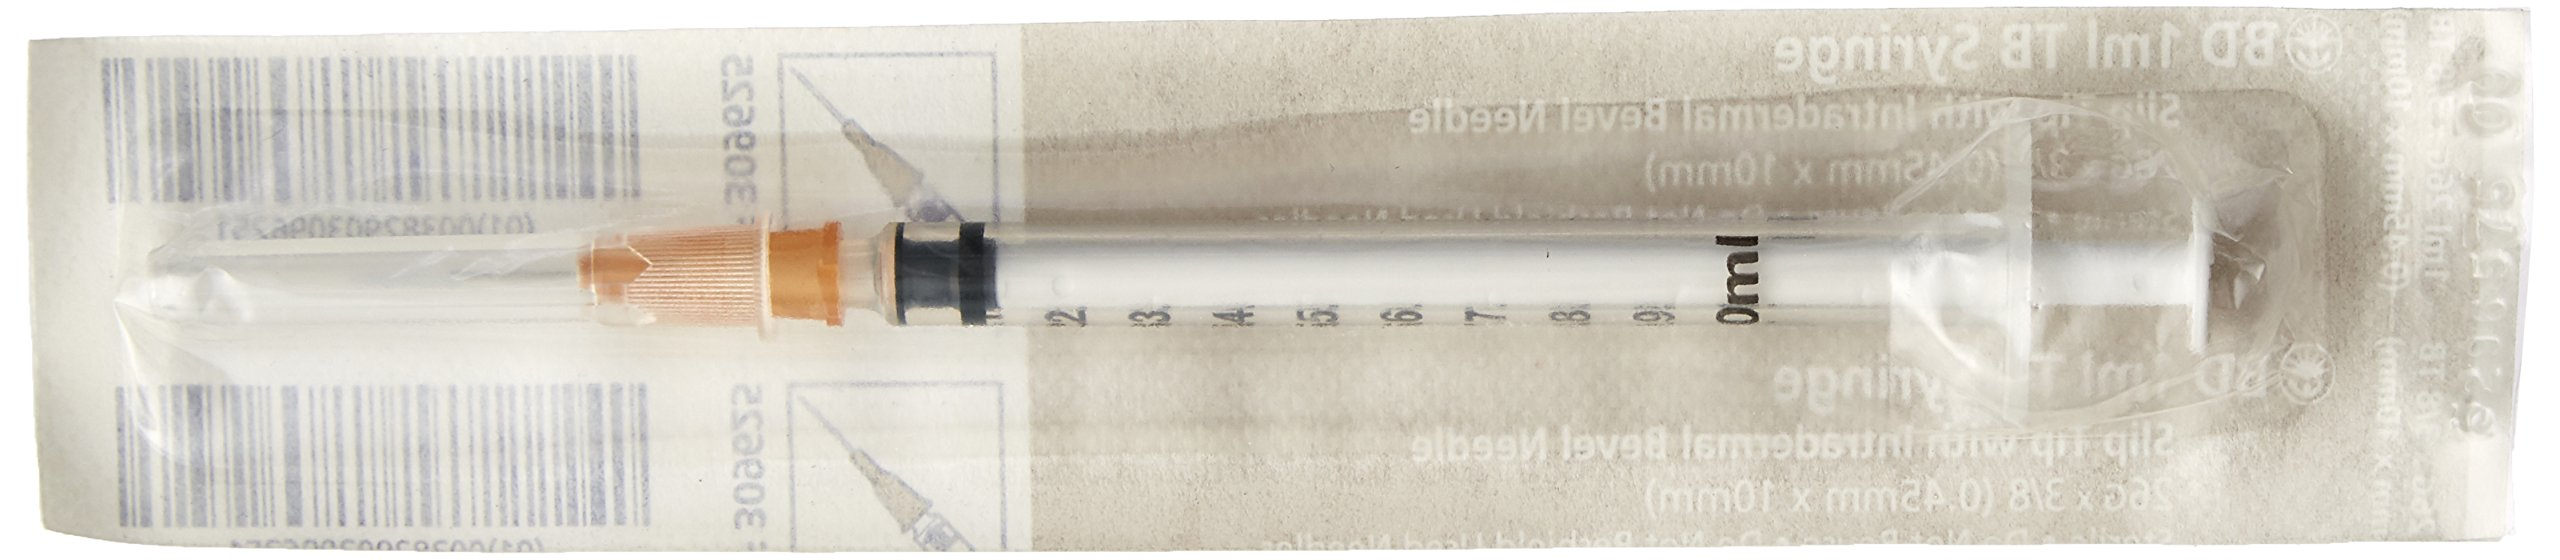 BD Medical Systems 309625 Tuberculin Syringe, Detachable Needle, Slip Tip, Intradermal Bevel, 26 Gauge x 3/8'' Size, 1 mL Capacity (Box of 100)